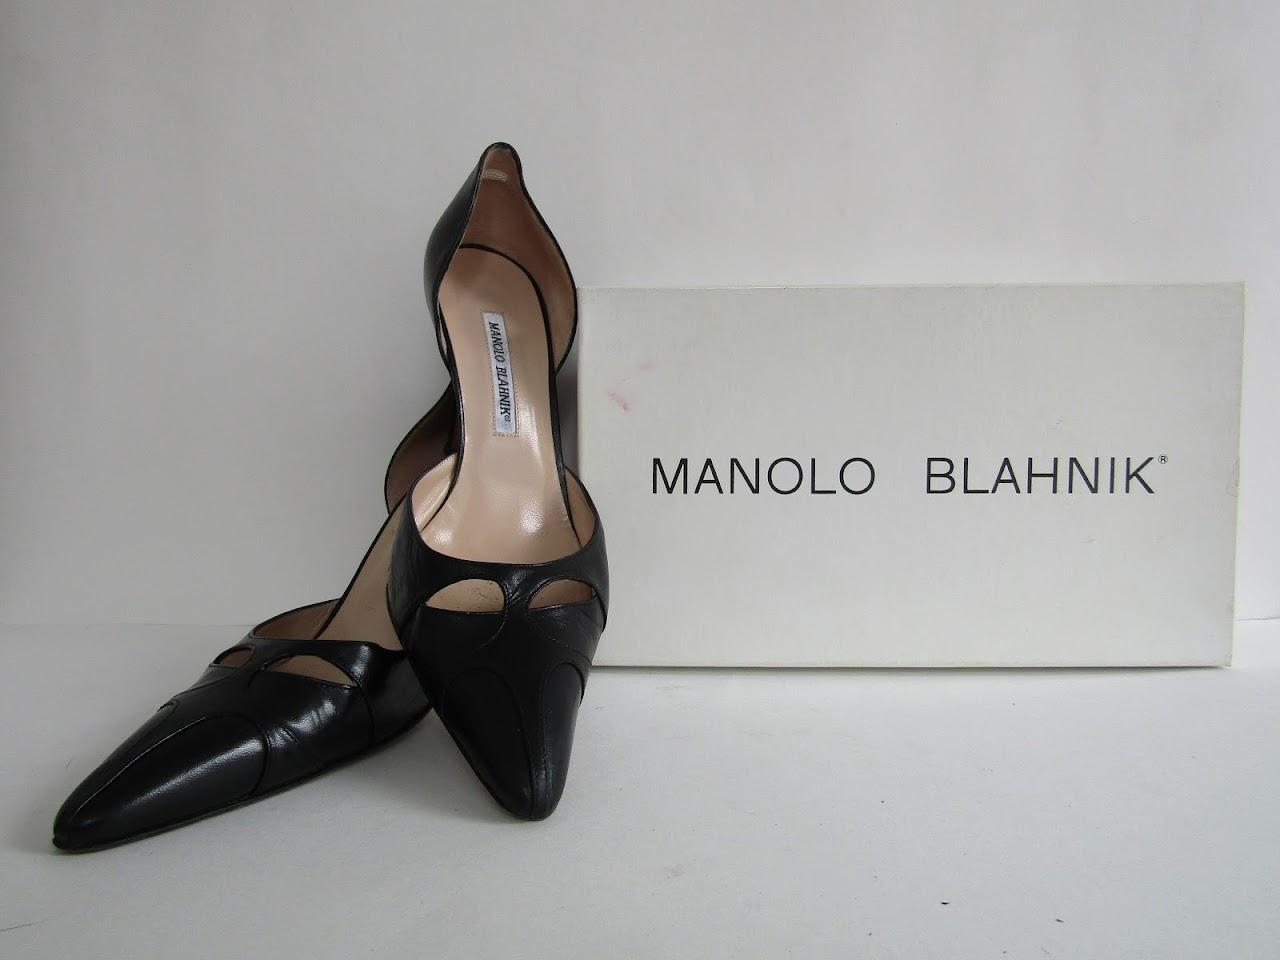 Manolo Blahnik Leather Pumps